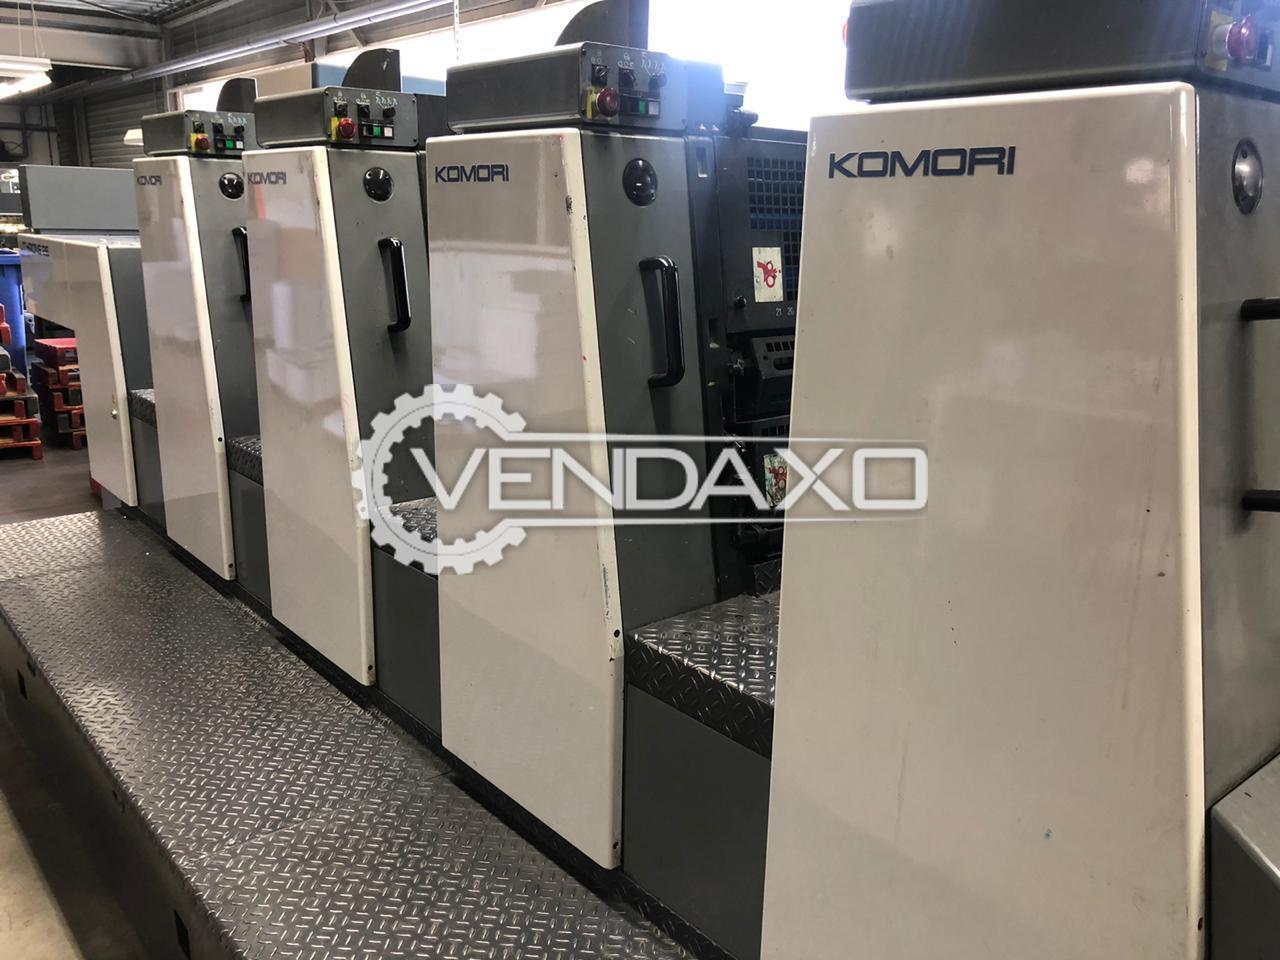 Komori Lithrone 426 EM Offset Printing Machine - Size - 20 x 26 Inch, 4 Color